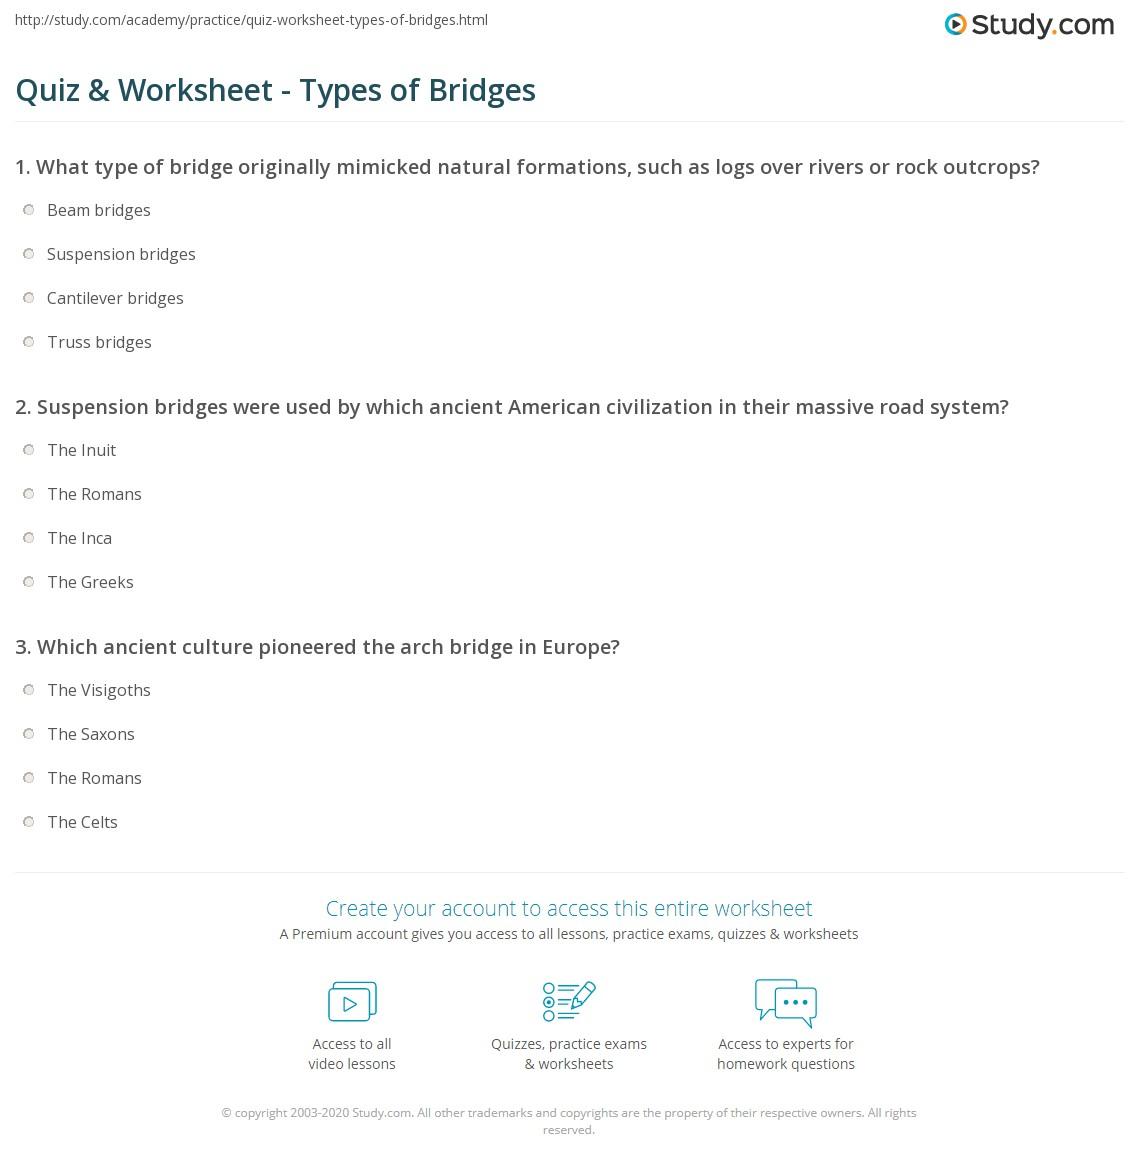 Quiz & Worksheet - Types of Bridges   Study.com